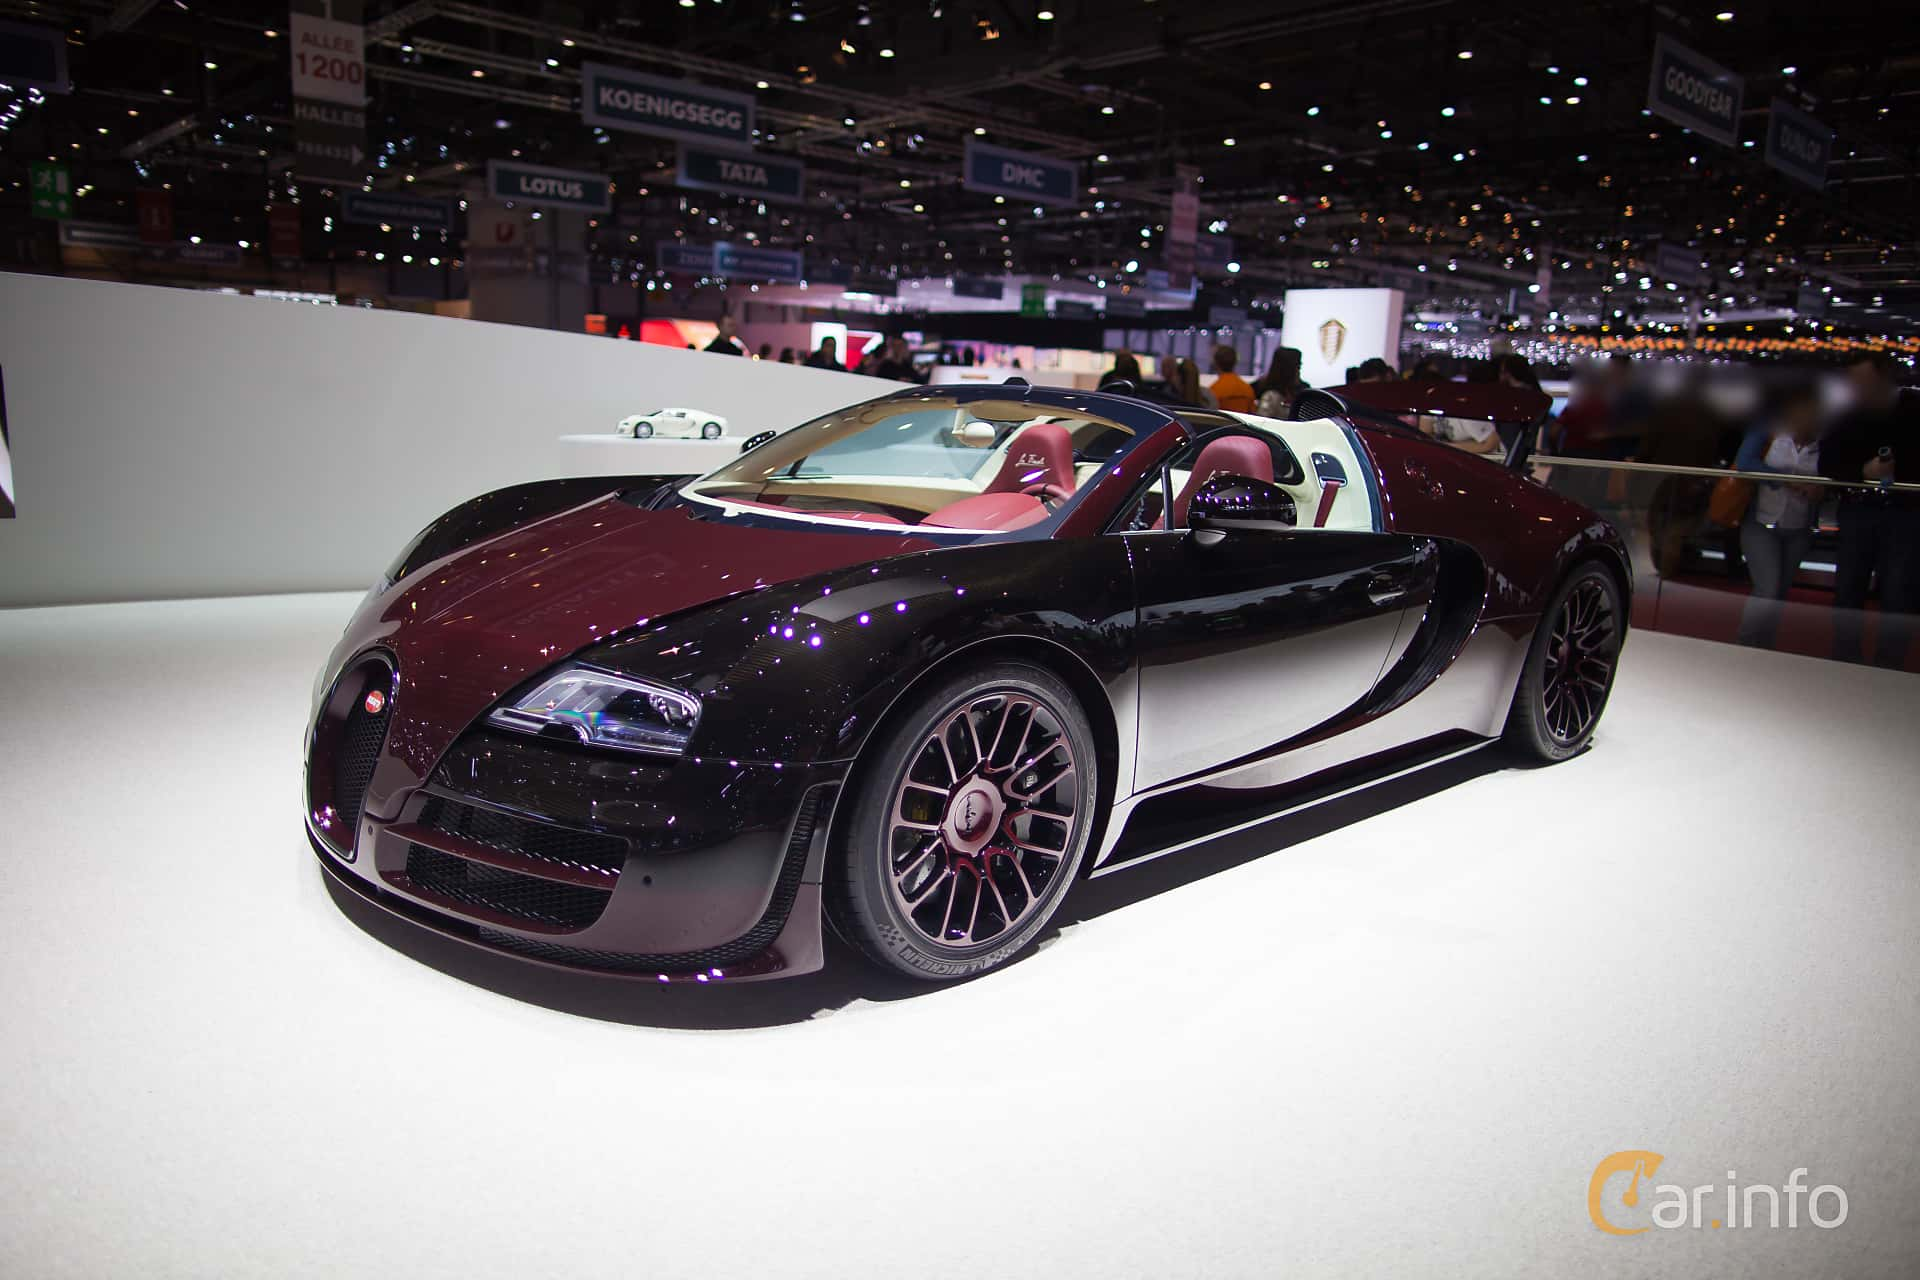 bugatti-veyron-front-side-geneva-motor-show-2015-0-66300 Cozy Bugatti Veyron W16 Engine Price Cars Trend